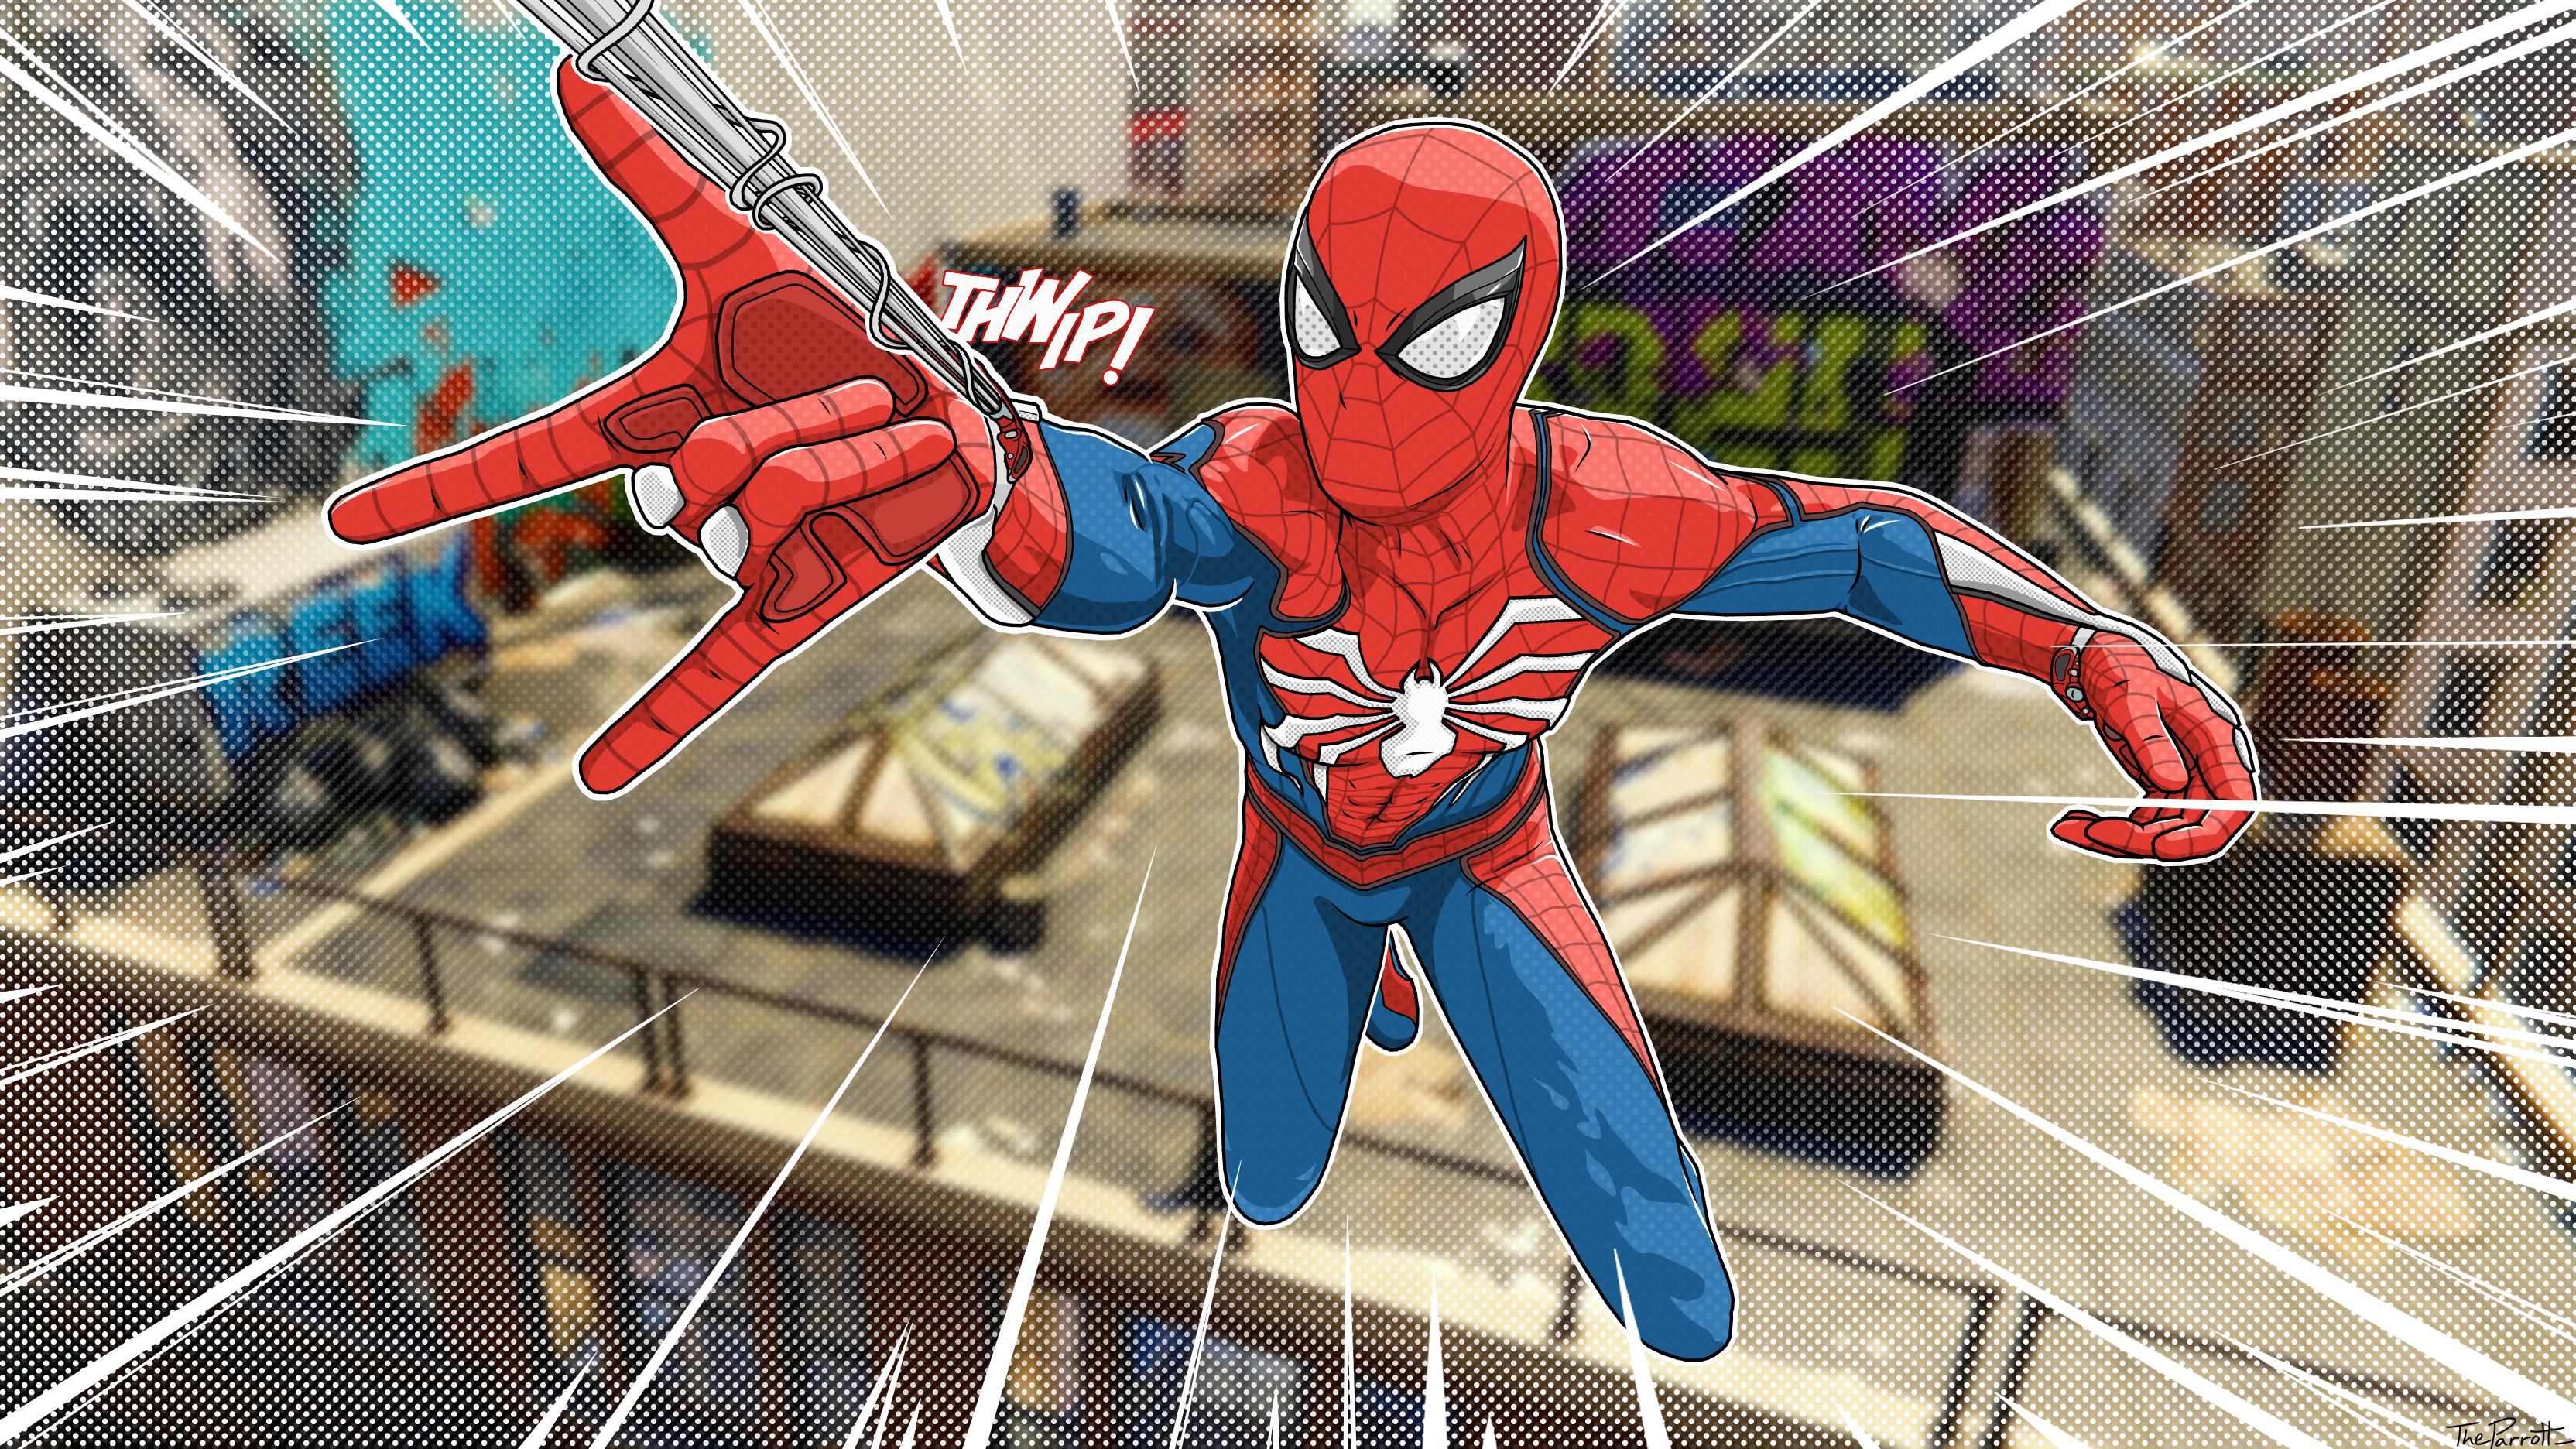 Spider Man Ps4 Comic Wallpaper By Darthplanet97 On Deviantart